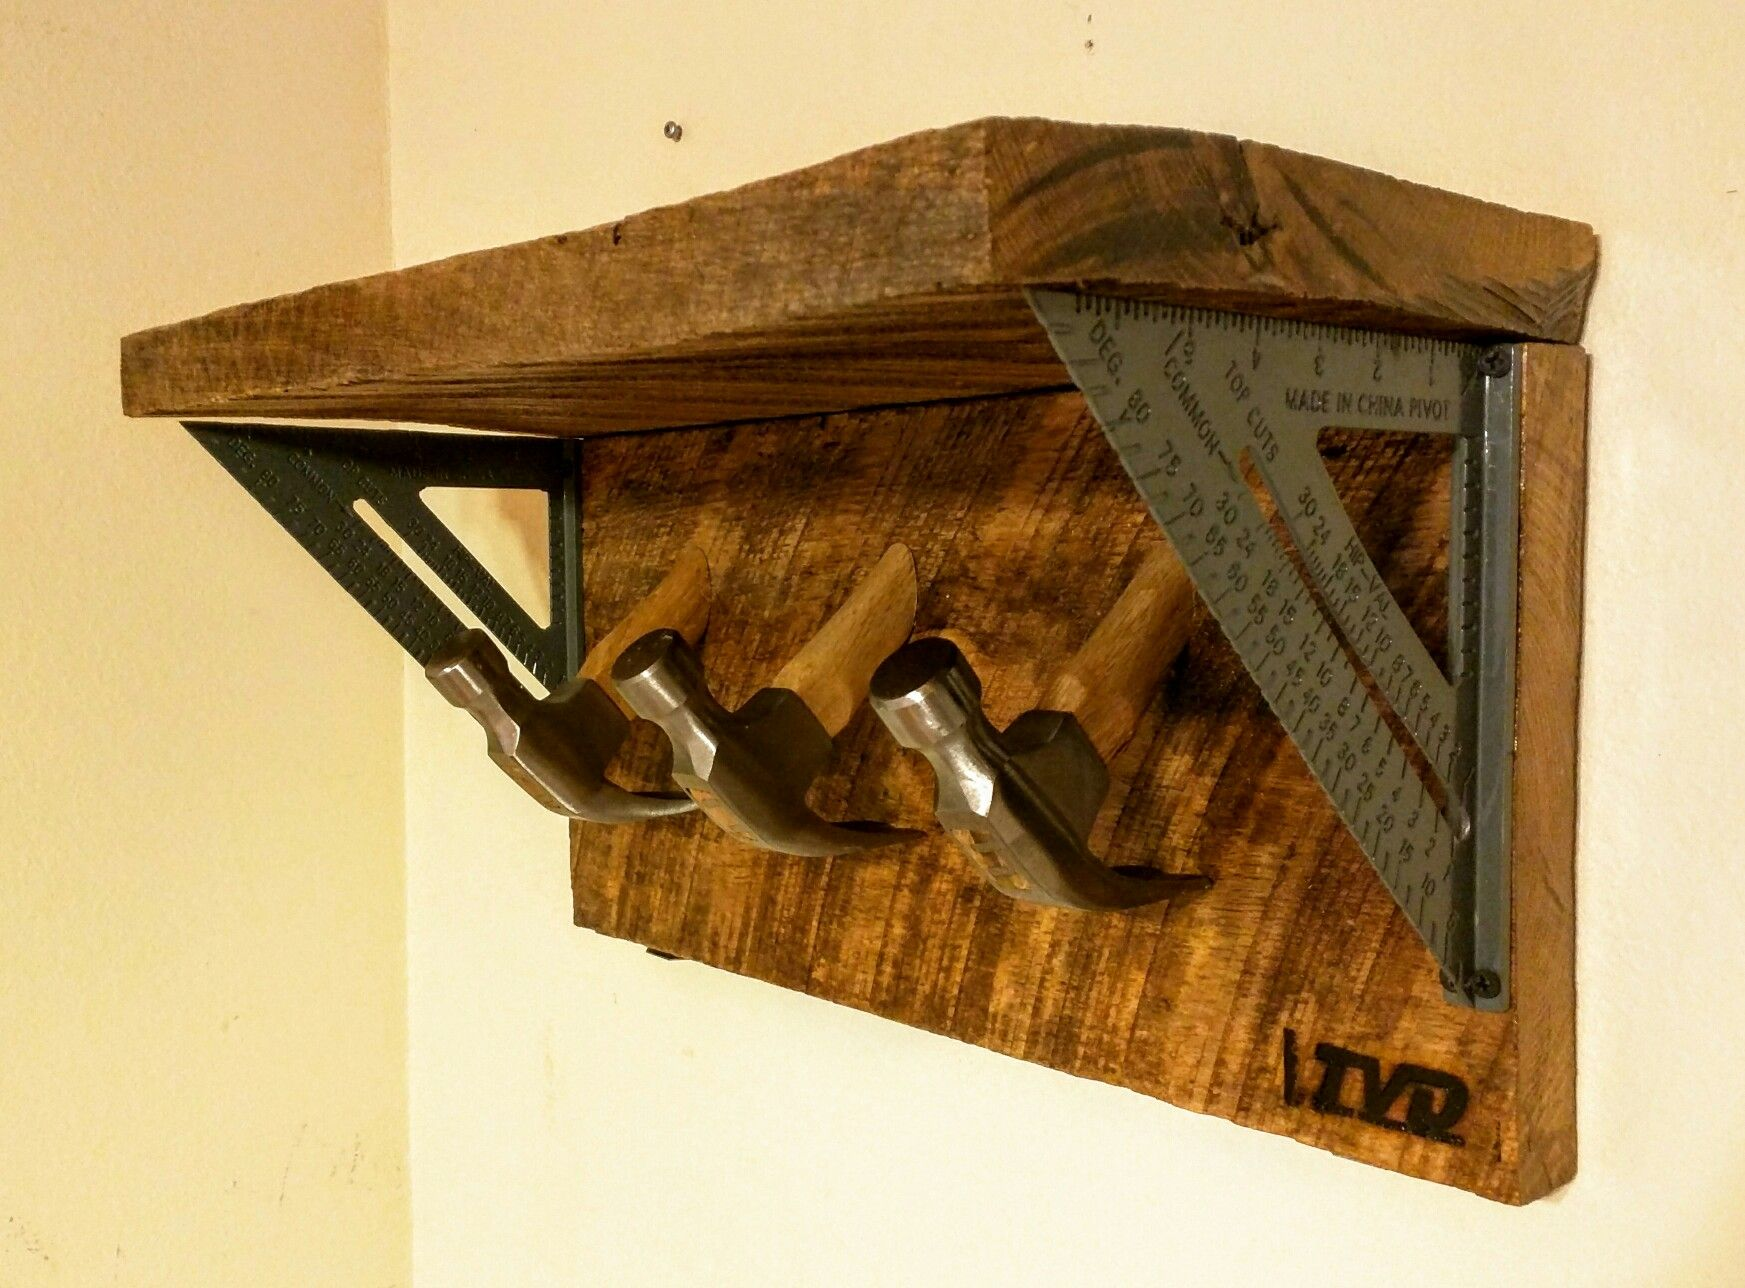 Homemade Hat Rack Ideas Hat Rack Ideas Wall Hat Rack Ideas Hat Rack Ideas Men Diy Baseball Hat Rack Hat Rack Diy Barn Wood Coat Rack Diy Hat Rack Hat Rack